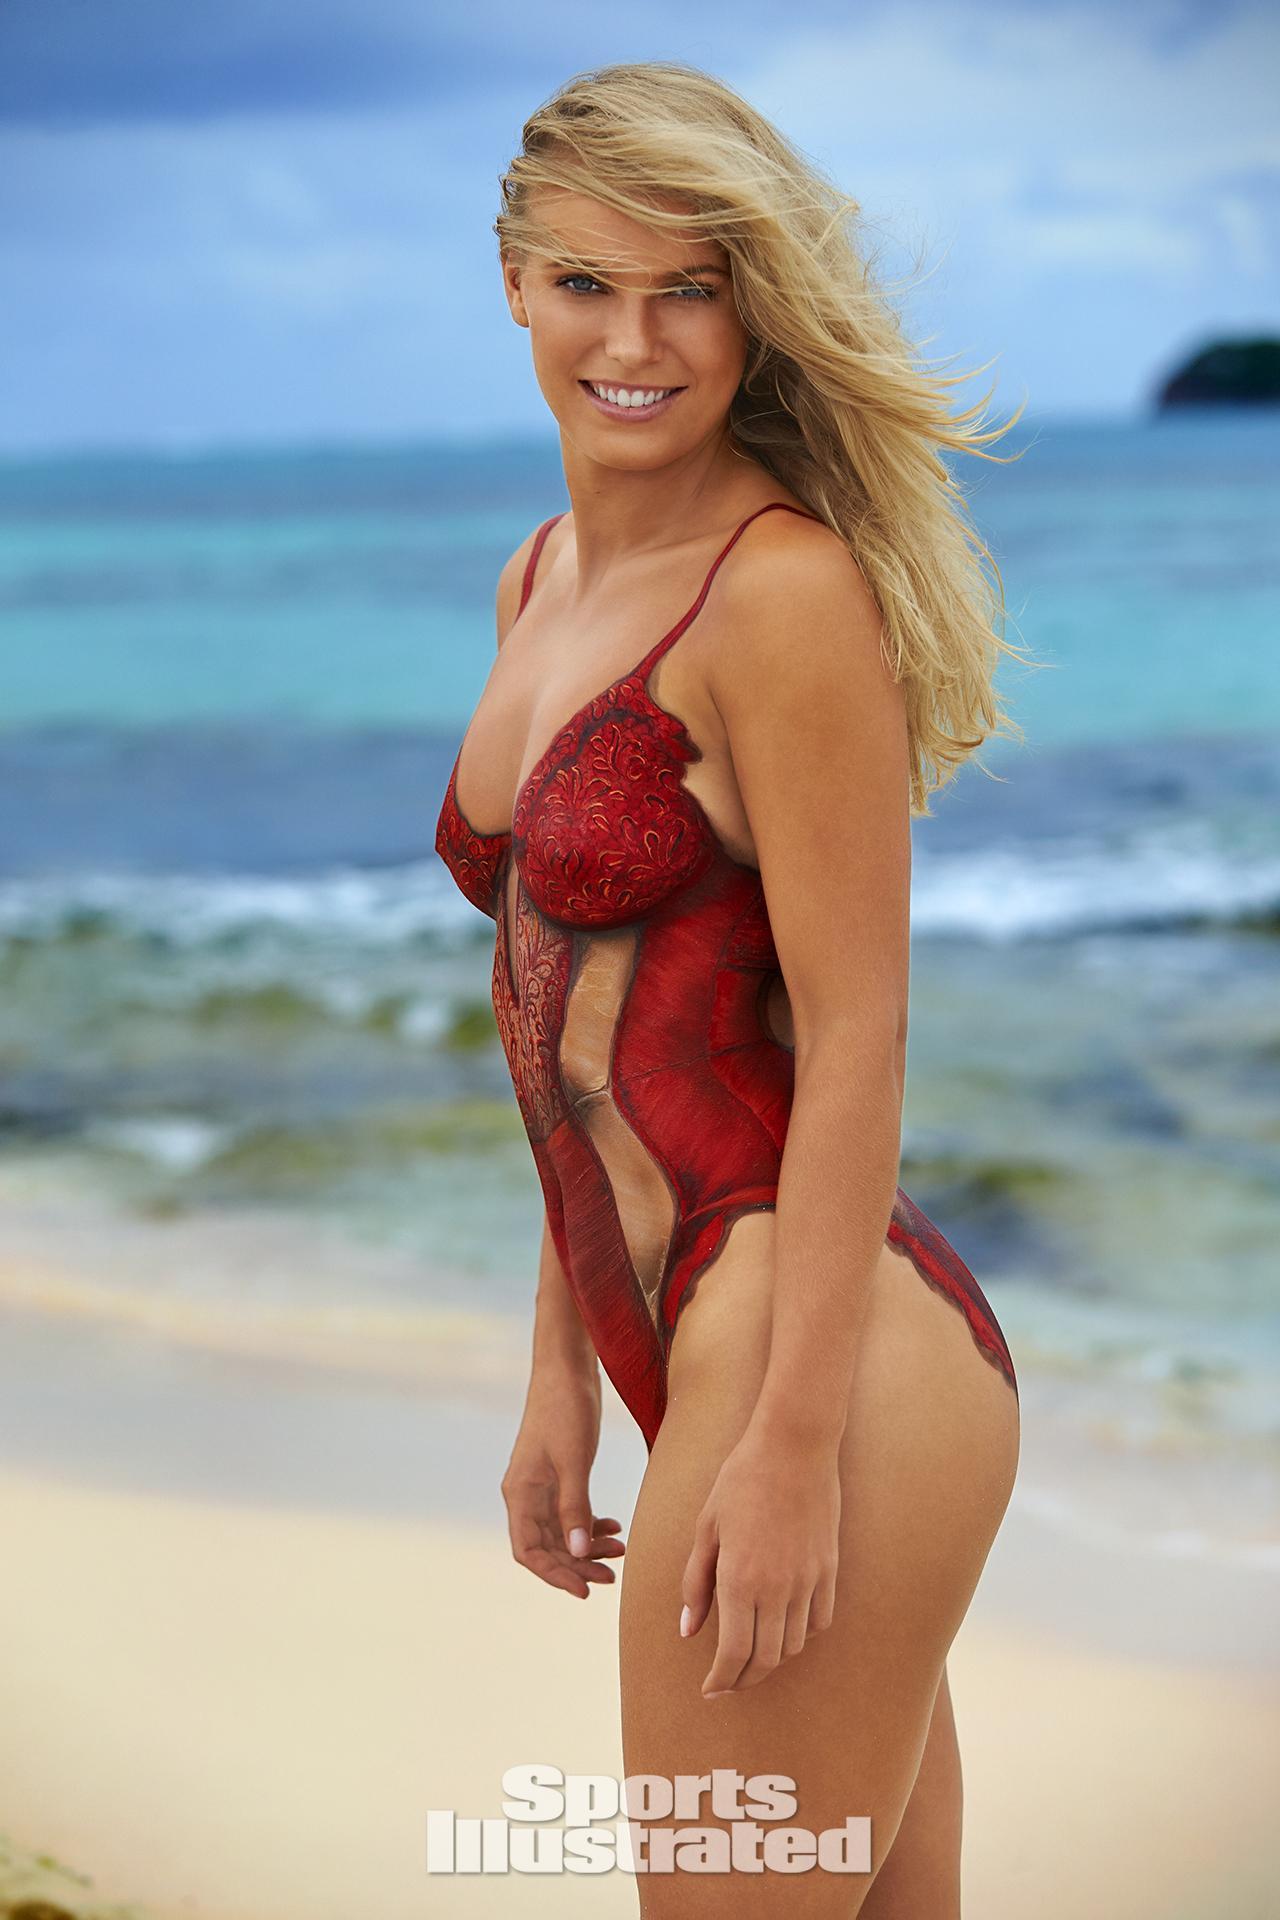 Caroline Wozniacki Swimsuit Body Paint Photos, Sports Illustrated ...